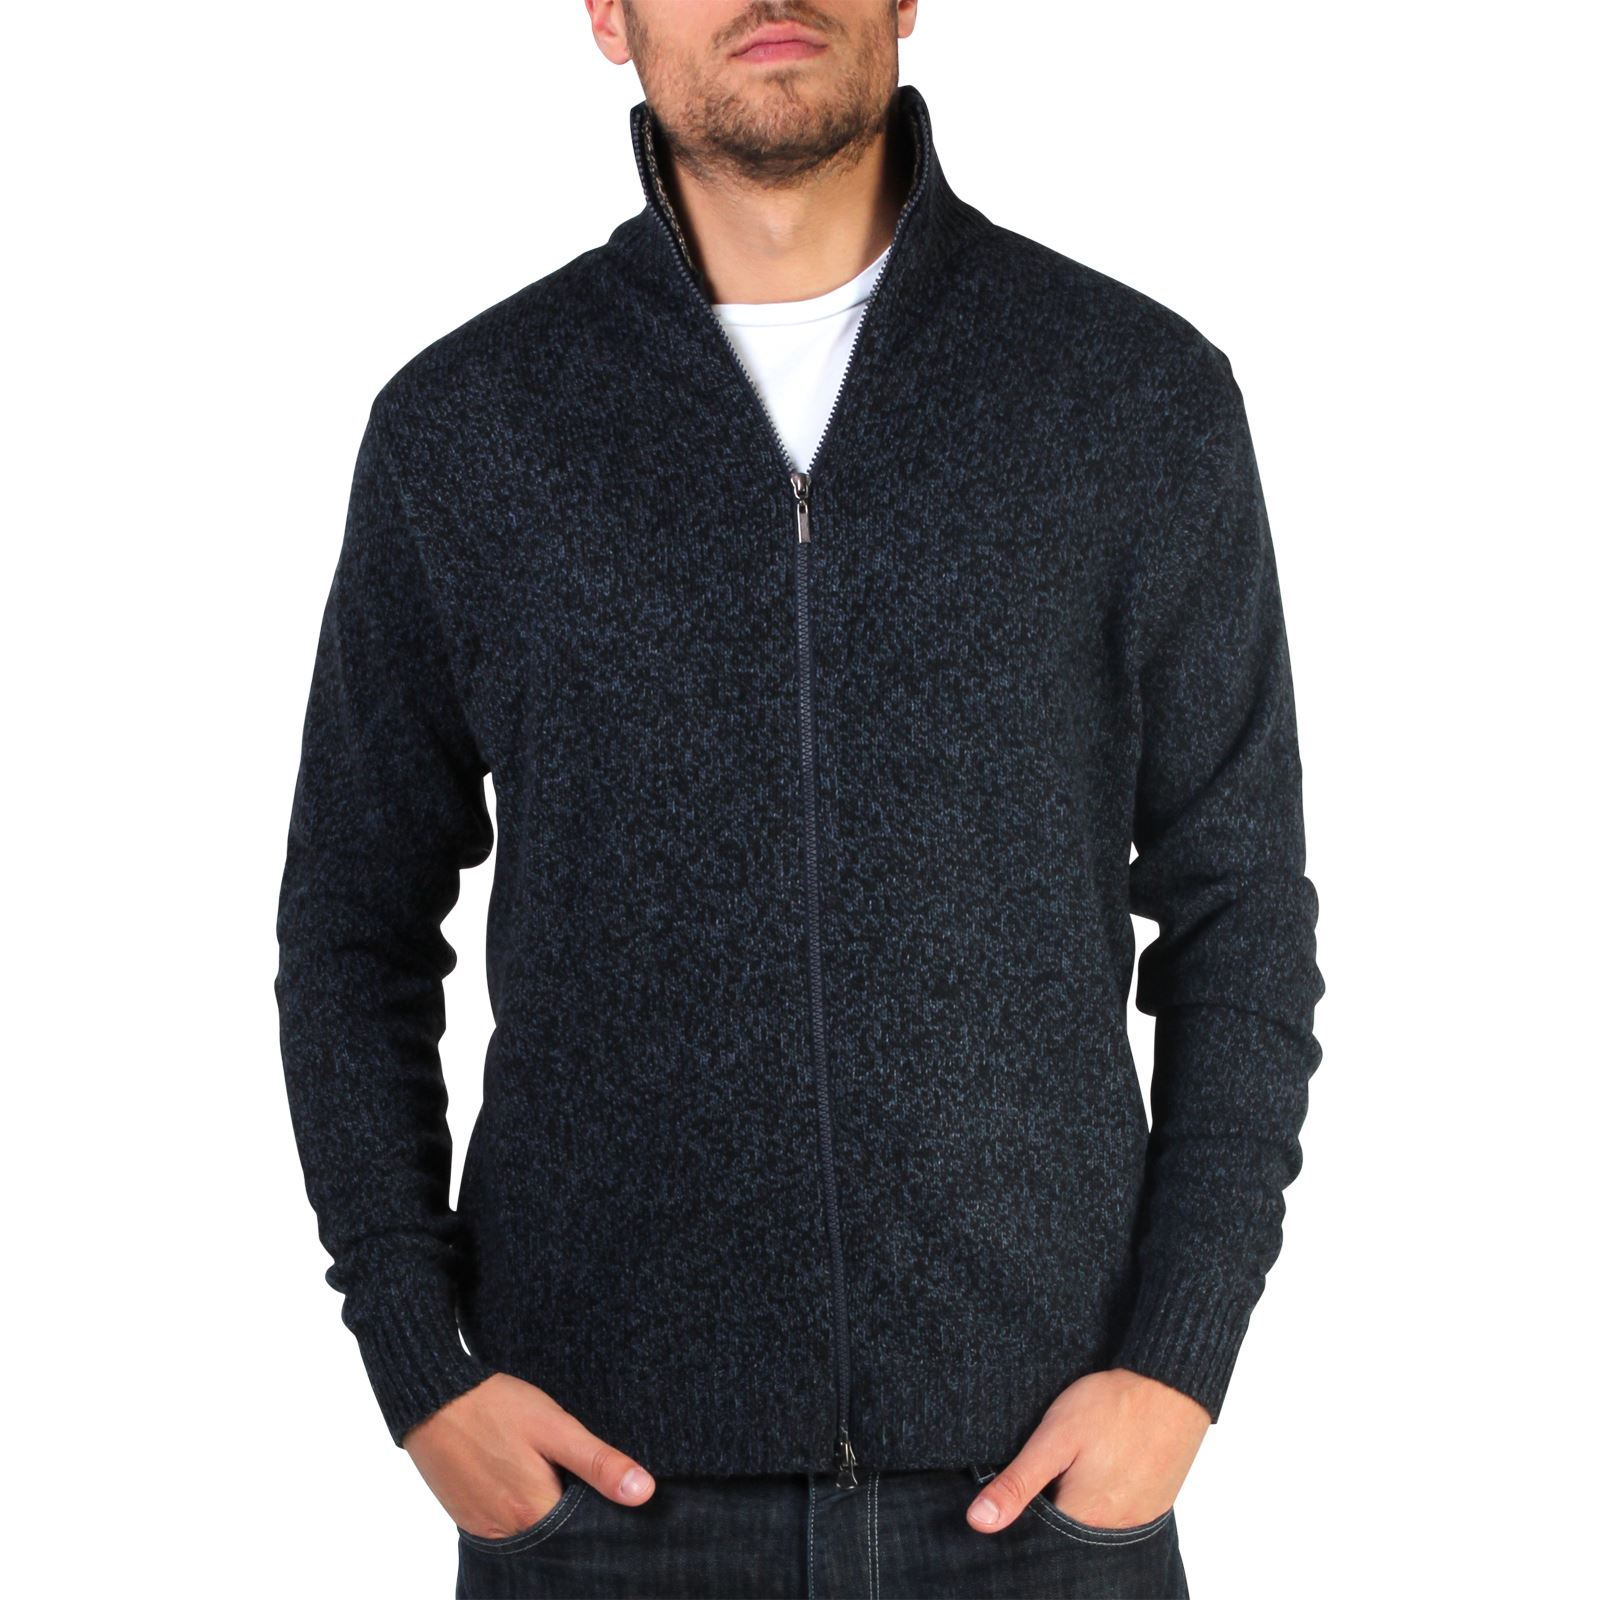 Mens-Wool-Jumper-Winter-Sweater-Zip-Up-Funnel-Neck-Soft-Knit-Cardigan-Top thumbnail 13